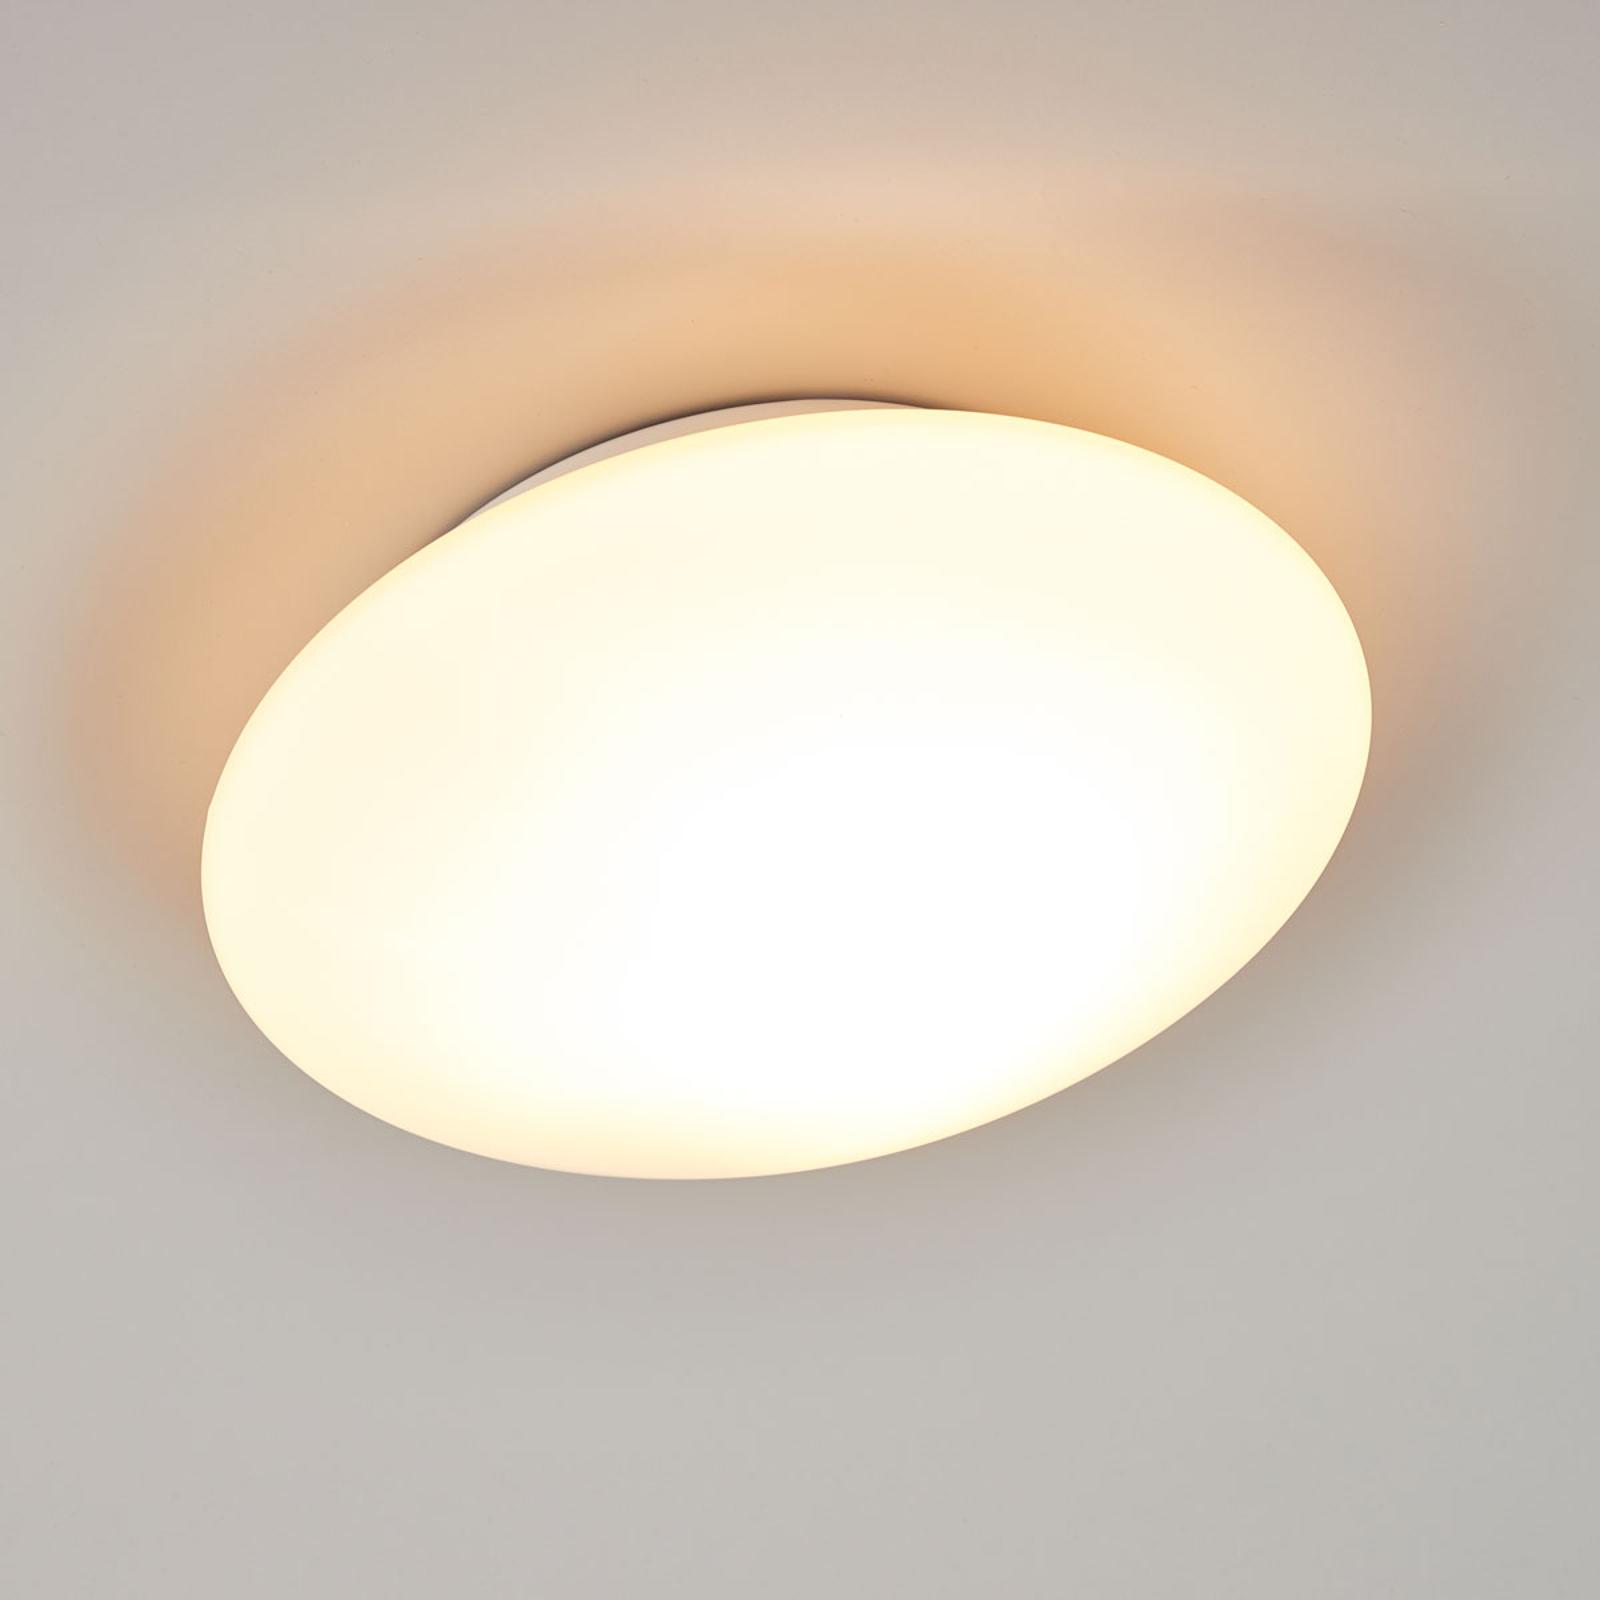 Glazen plafondlamp OPAL, 25 cm